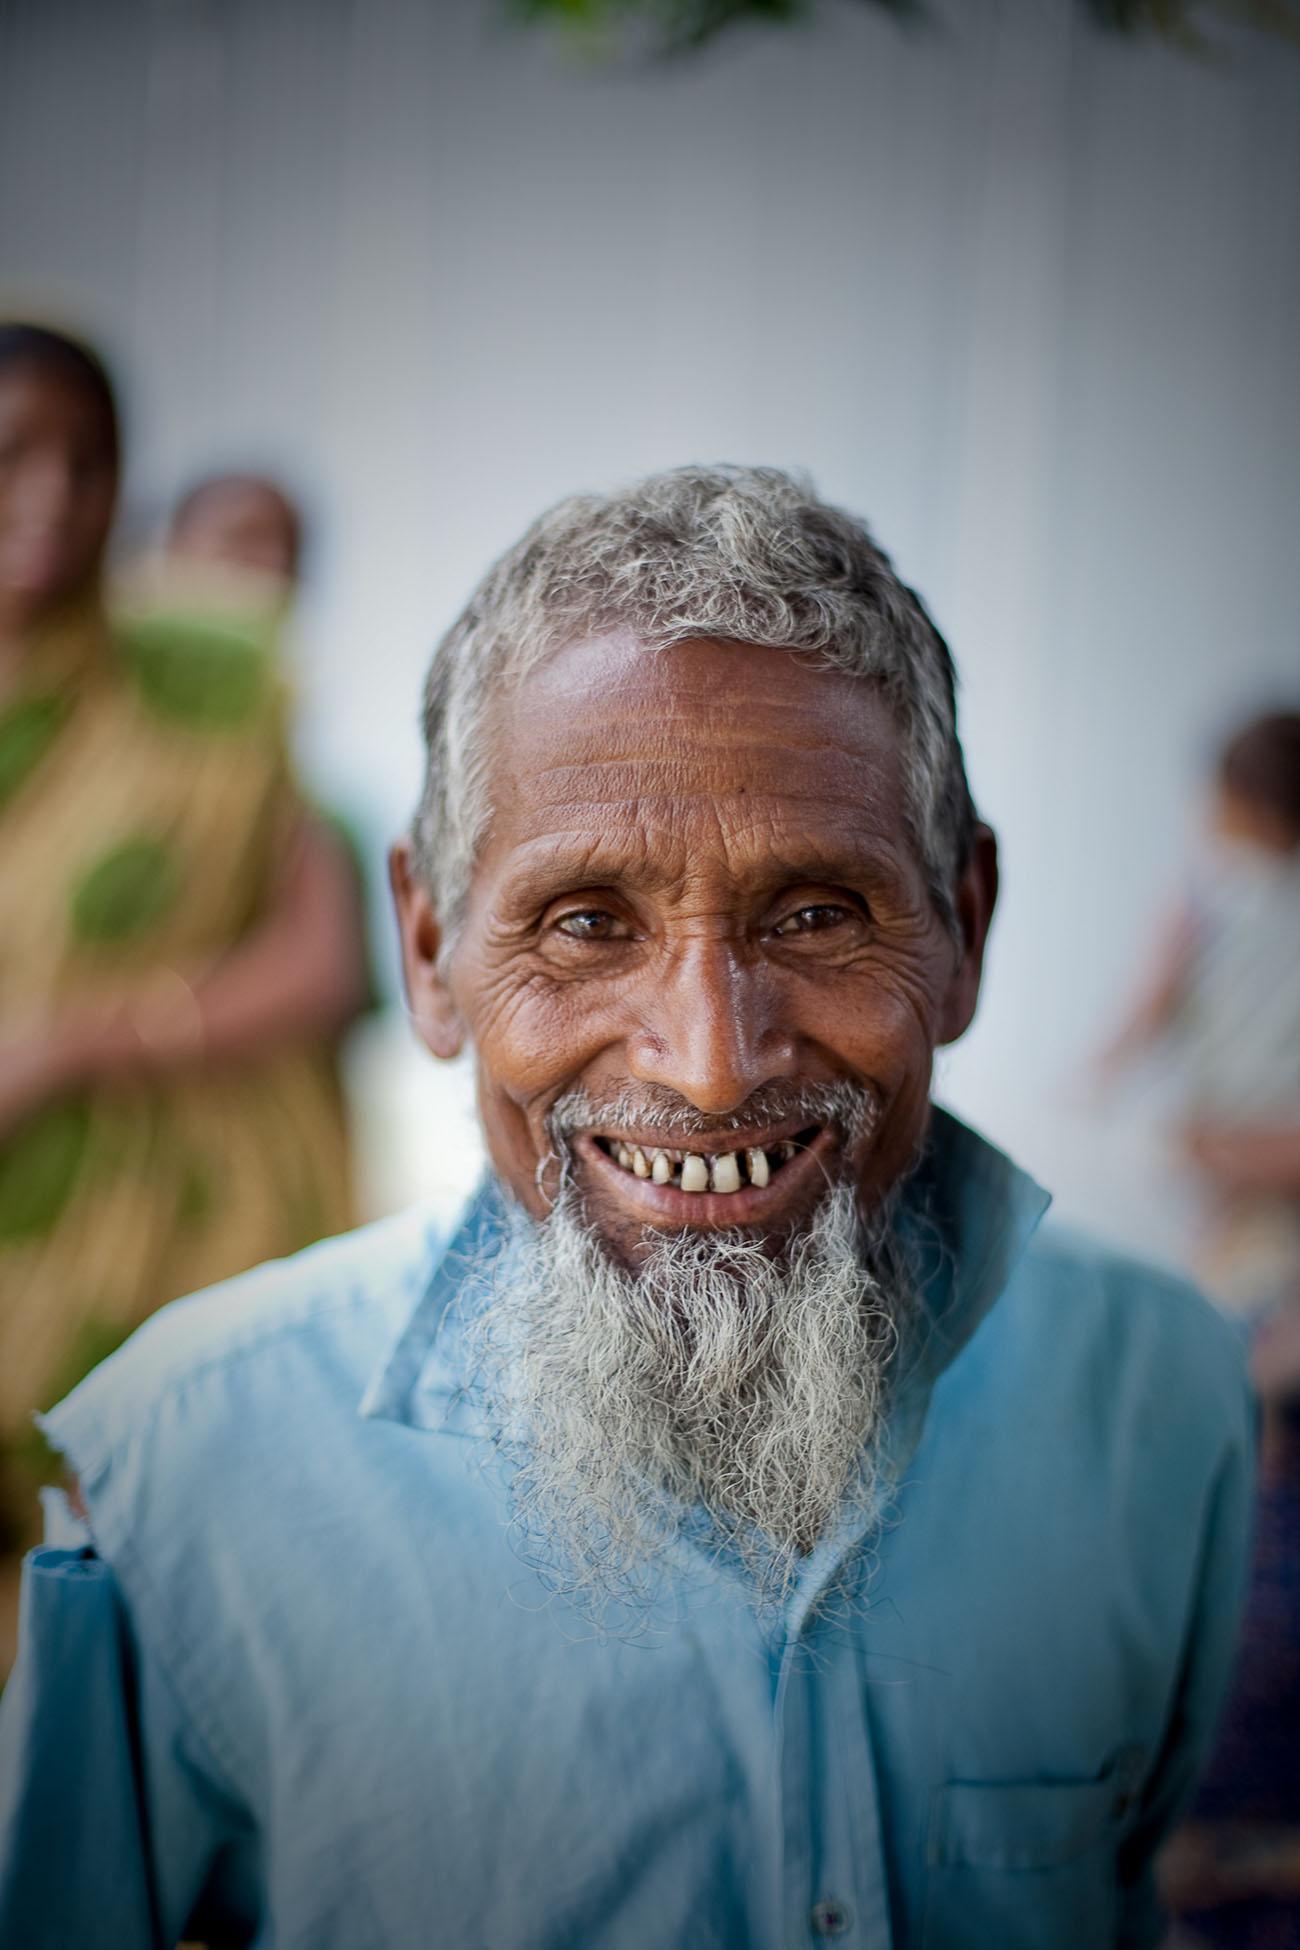 An old Bangladeshi man smiles for a photograph.